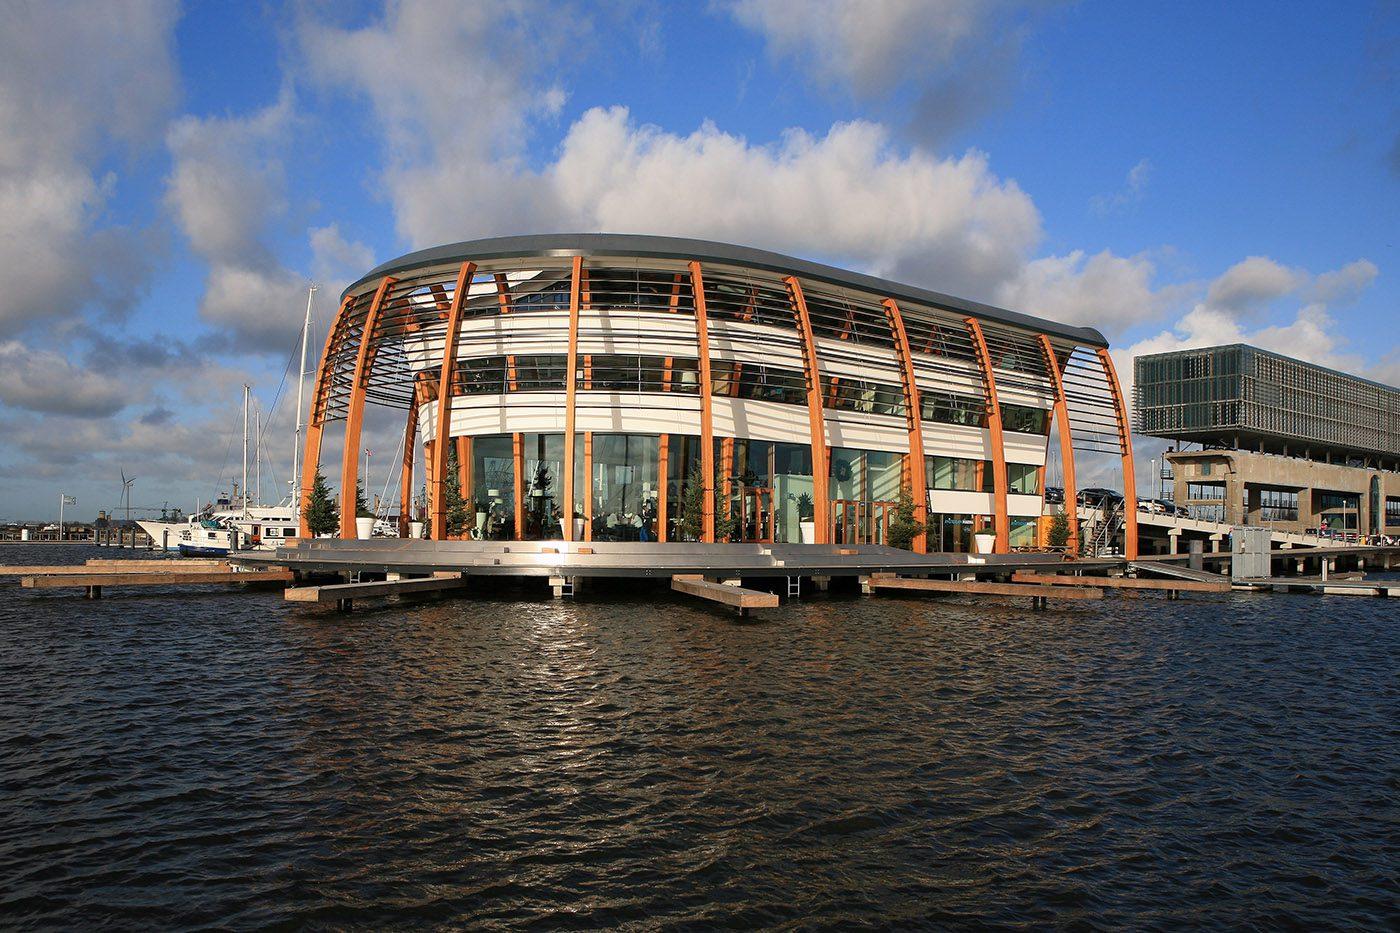 Houten spanten geven havengebouw karakter » Bouwwereld.nl